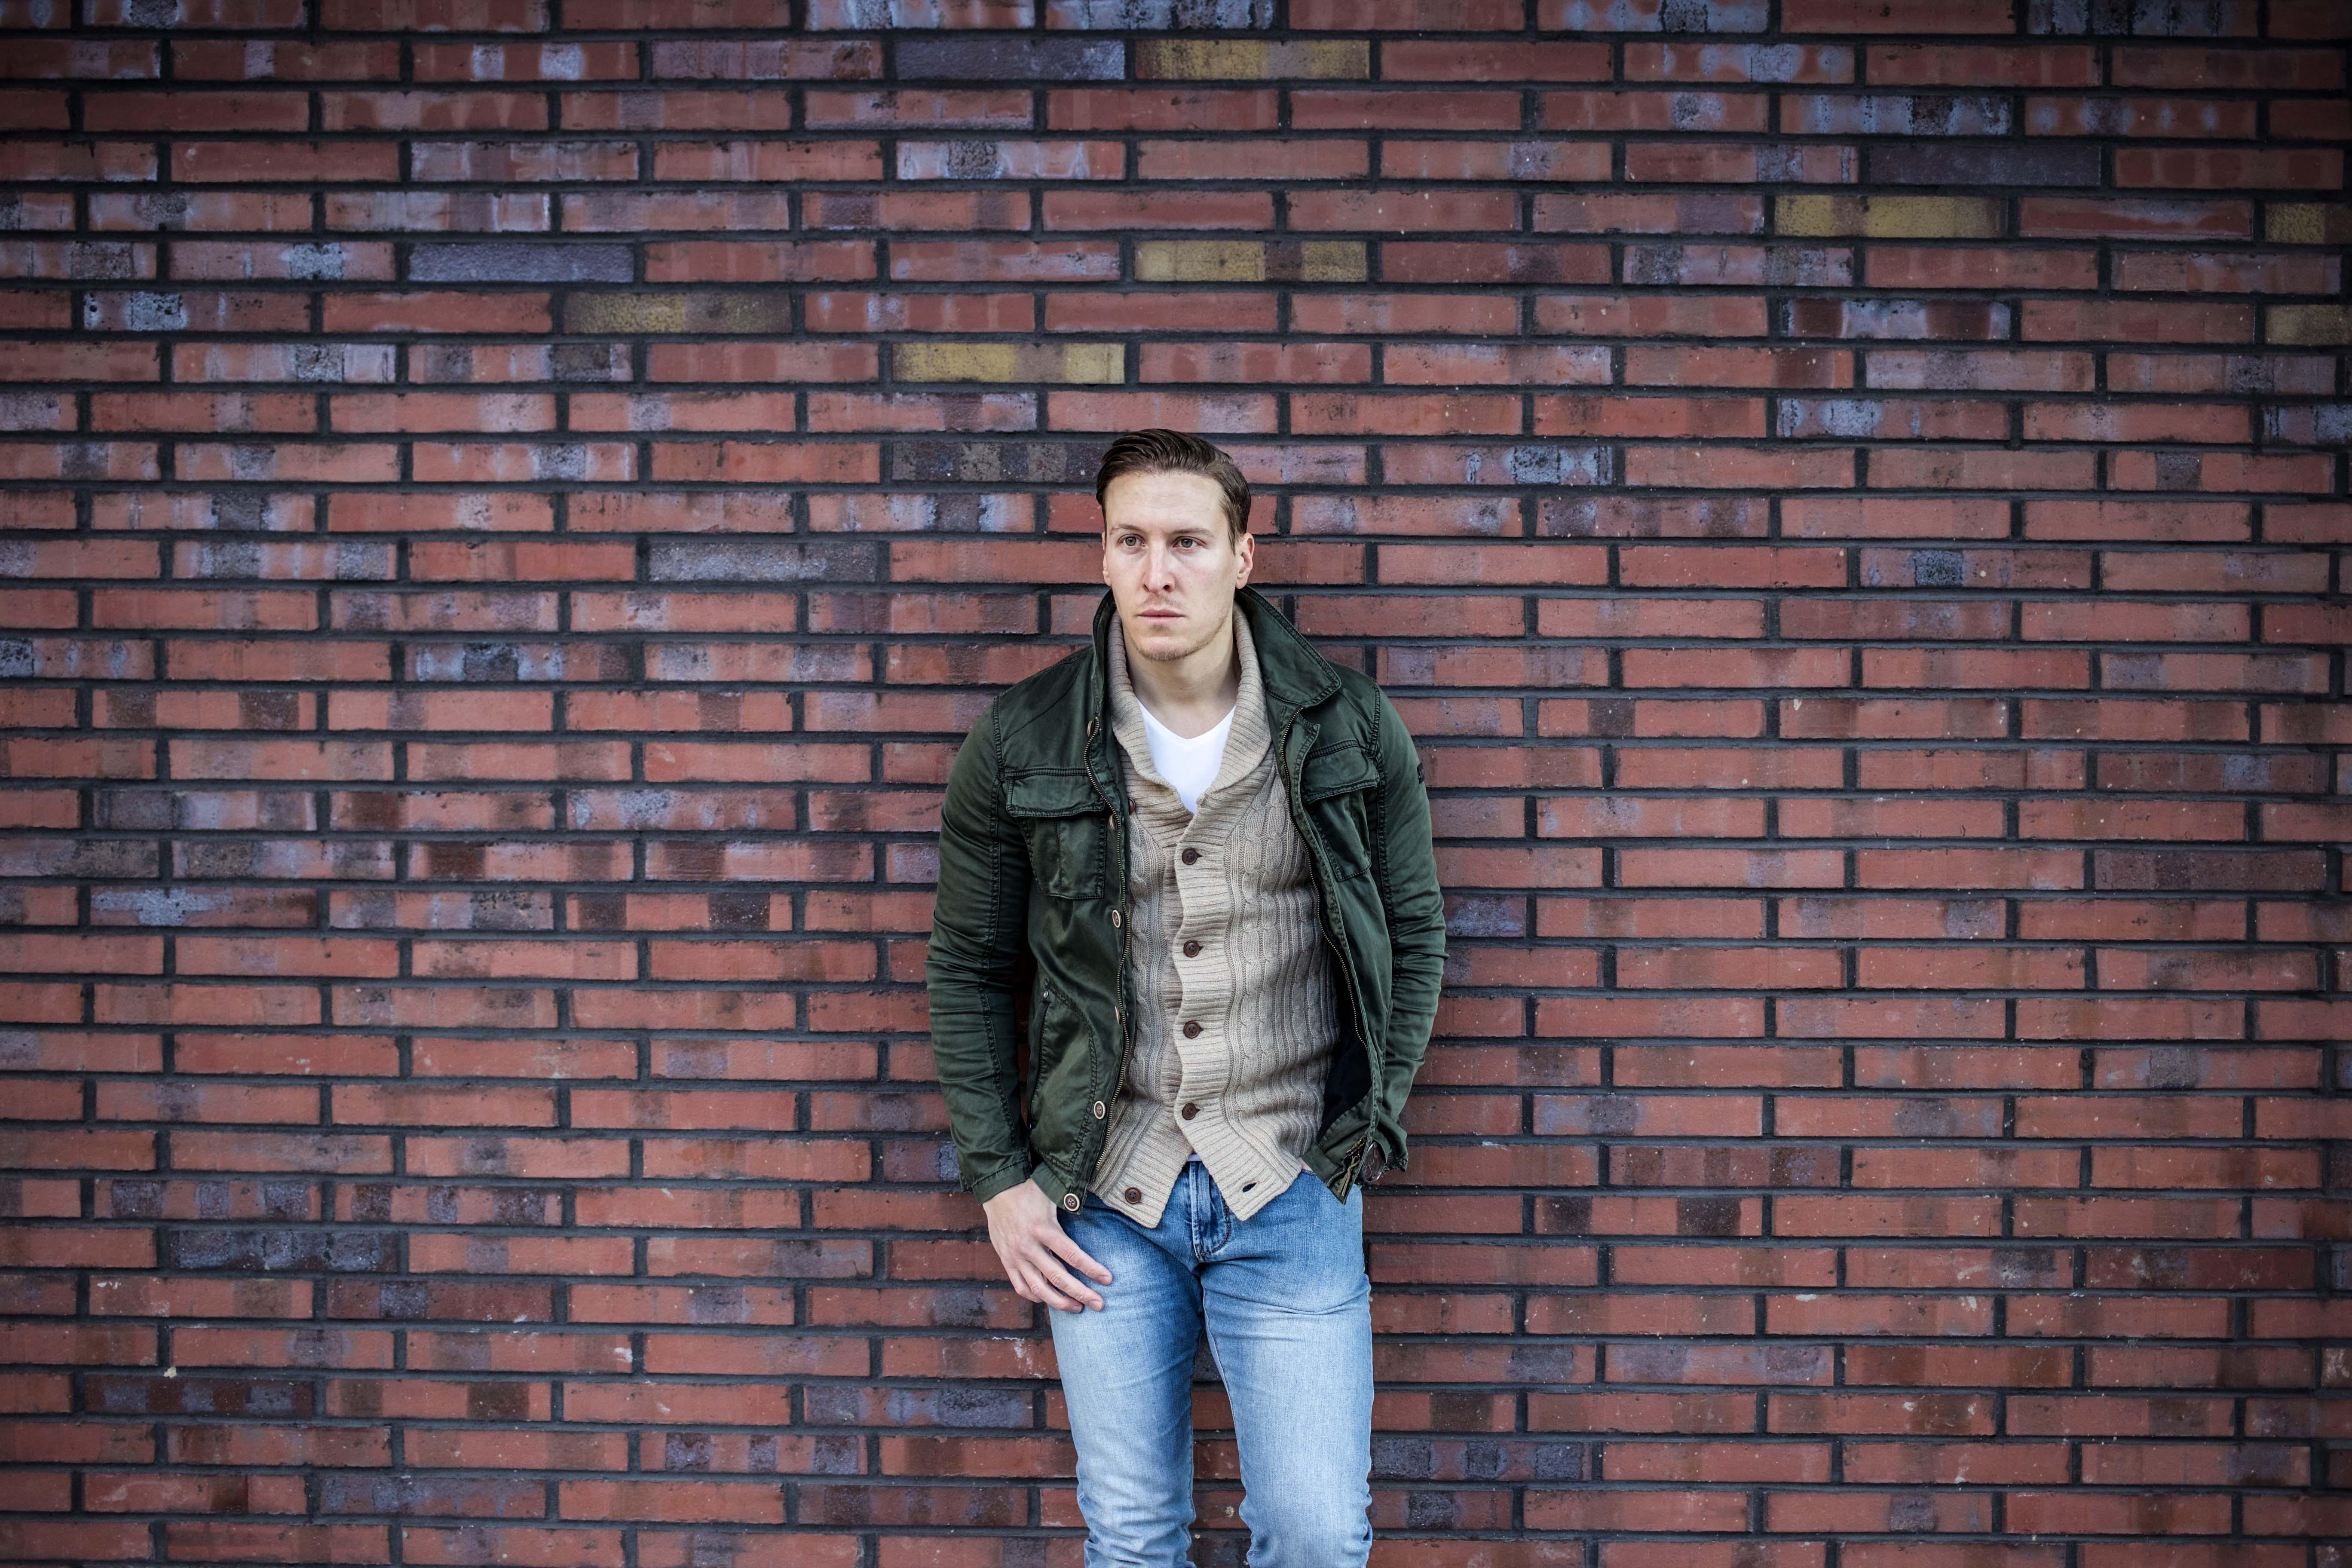 strickjacke-kombinieren-männer-beige-cardigan-blue-jeans-fashionblog-berlin-modeblog_9028